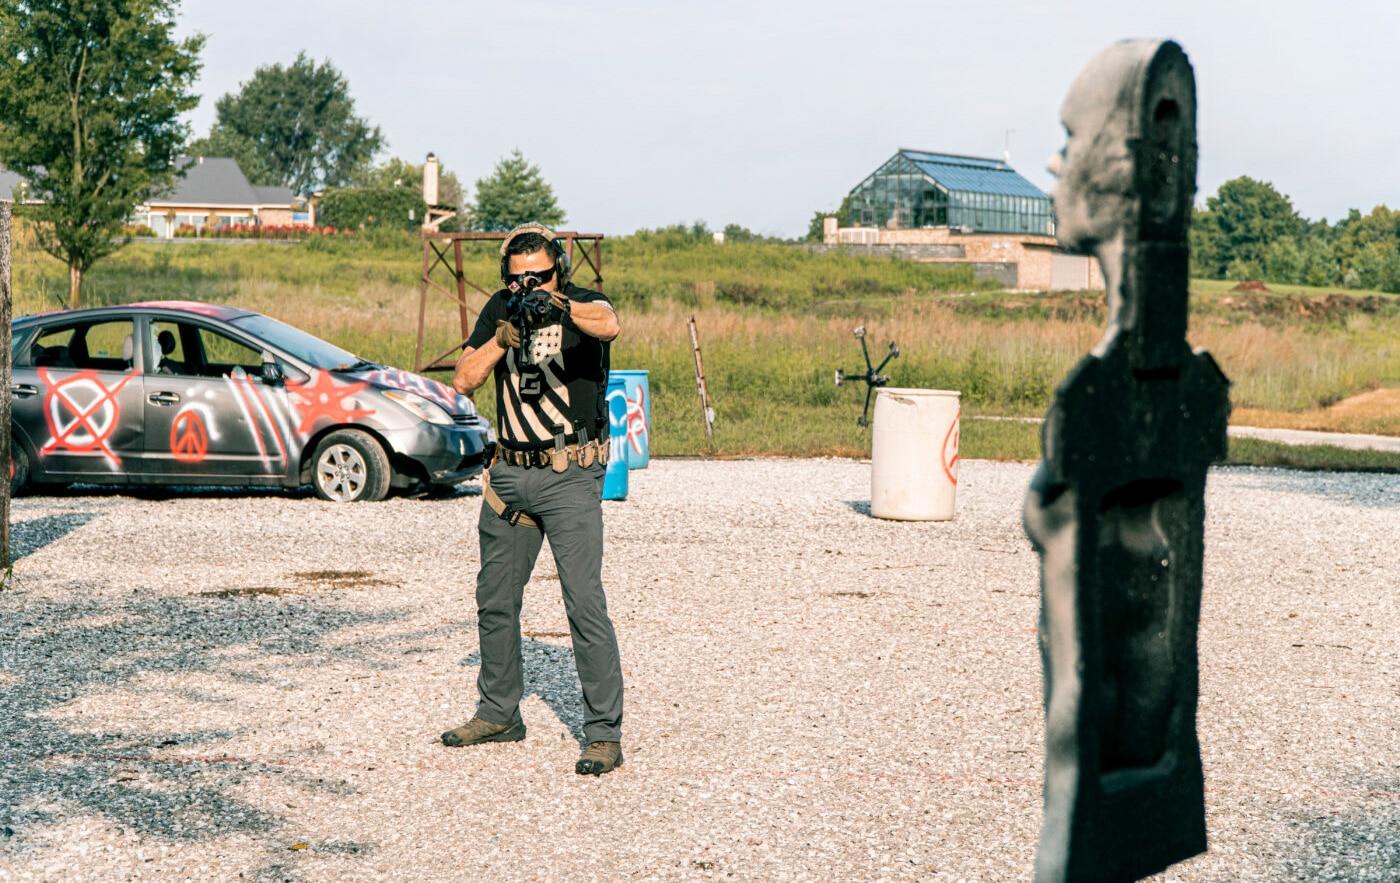 Man using 3D shooting targets during training